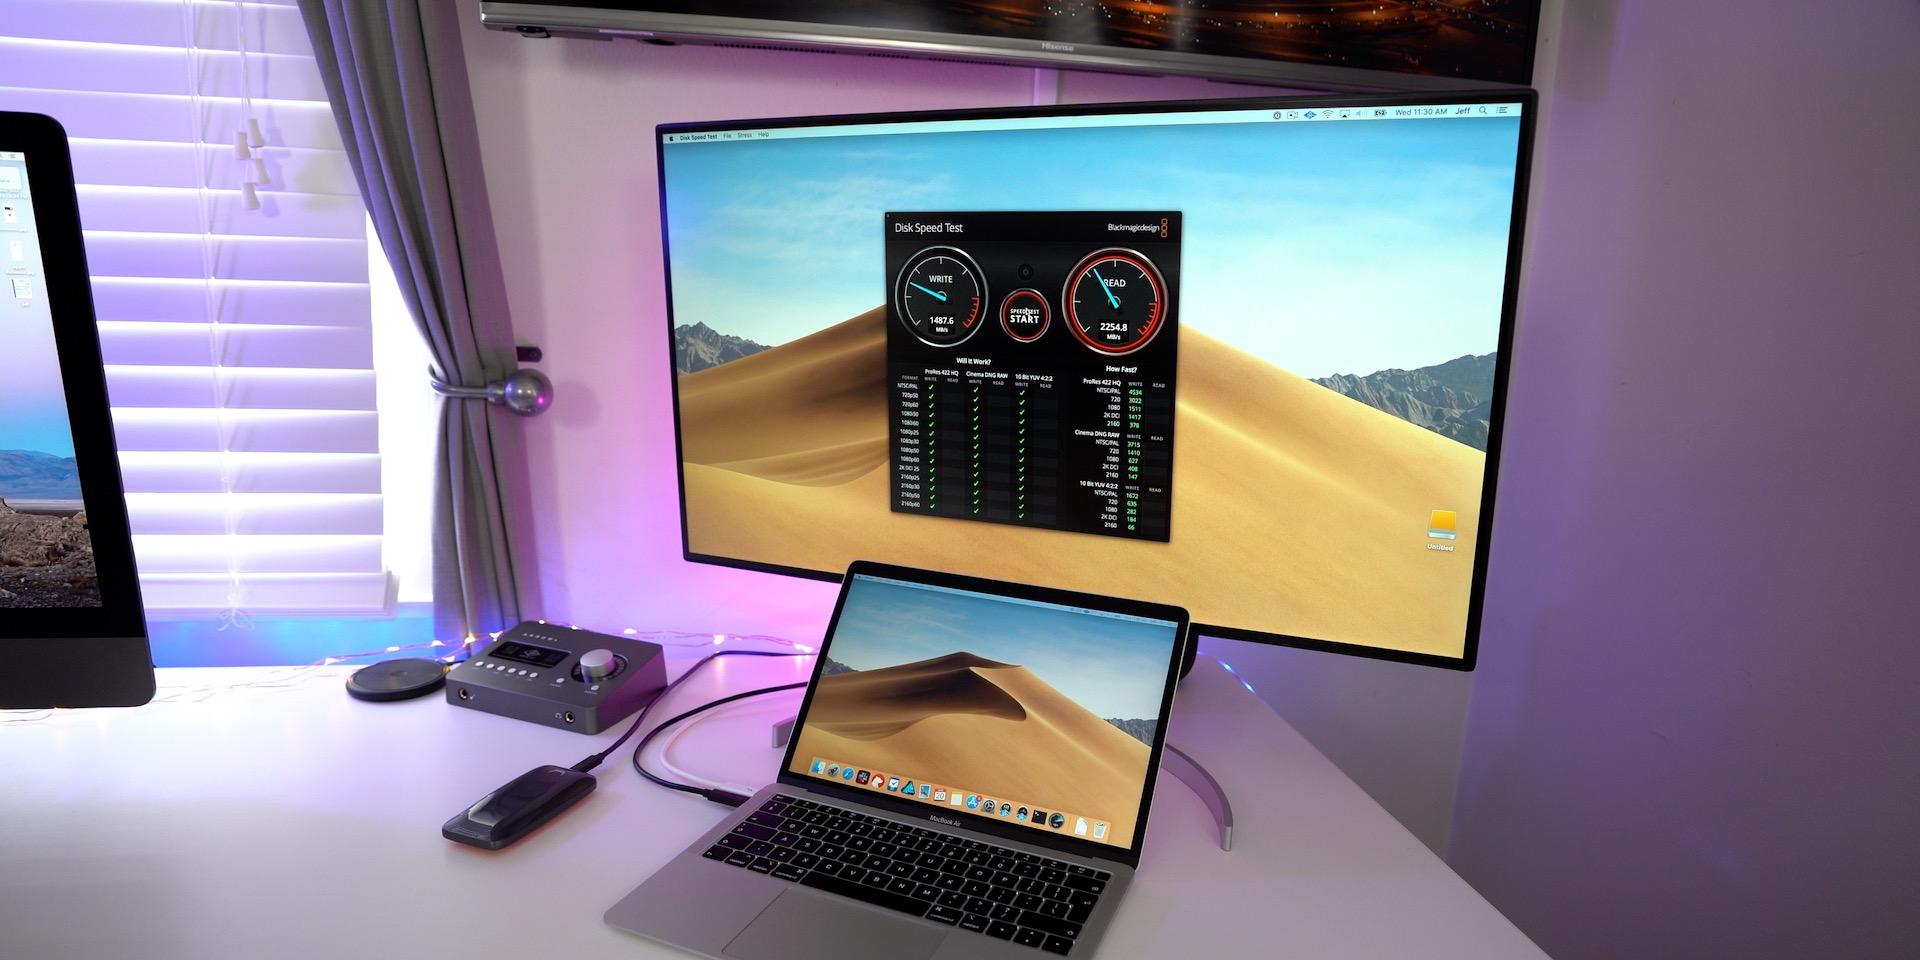 LG 32UL950 UltraFine 4K Display Review SSD Speed Test Thunderbolt 3